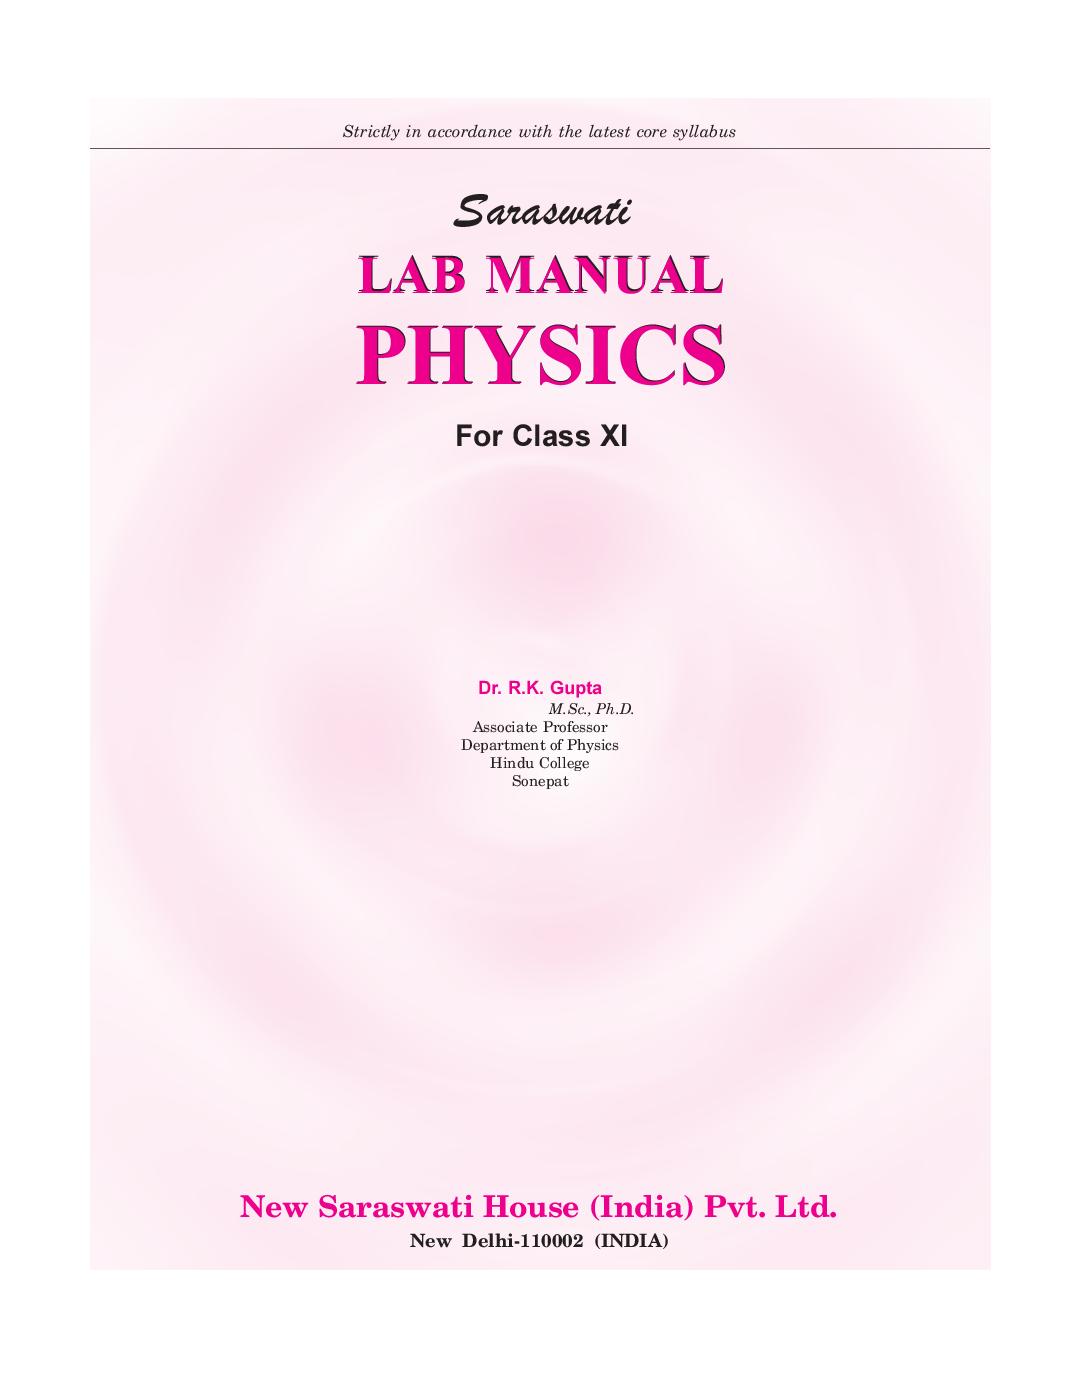 Physics lab manual 11th ebook applied physics edition 11 array download saraswati lab manual physics class xi pdf online rh kopykitab com fandeluxe Images